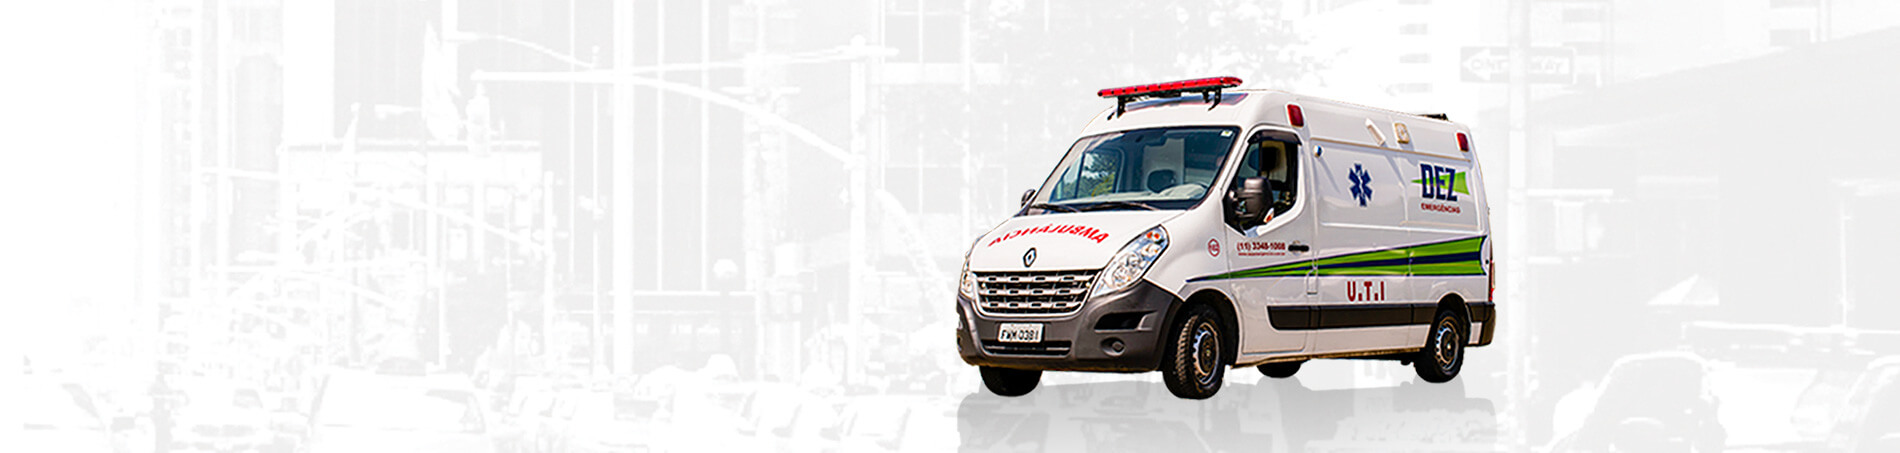 banner-ambulancia-particular-dez-emergencias